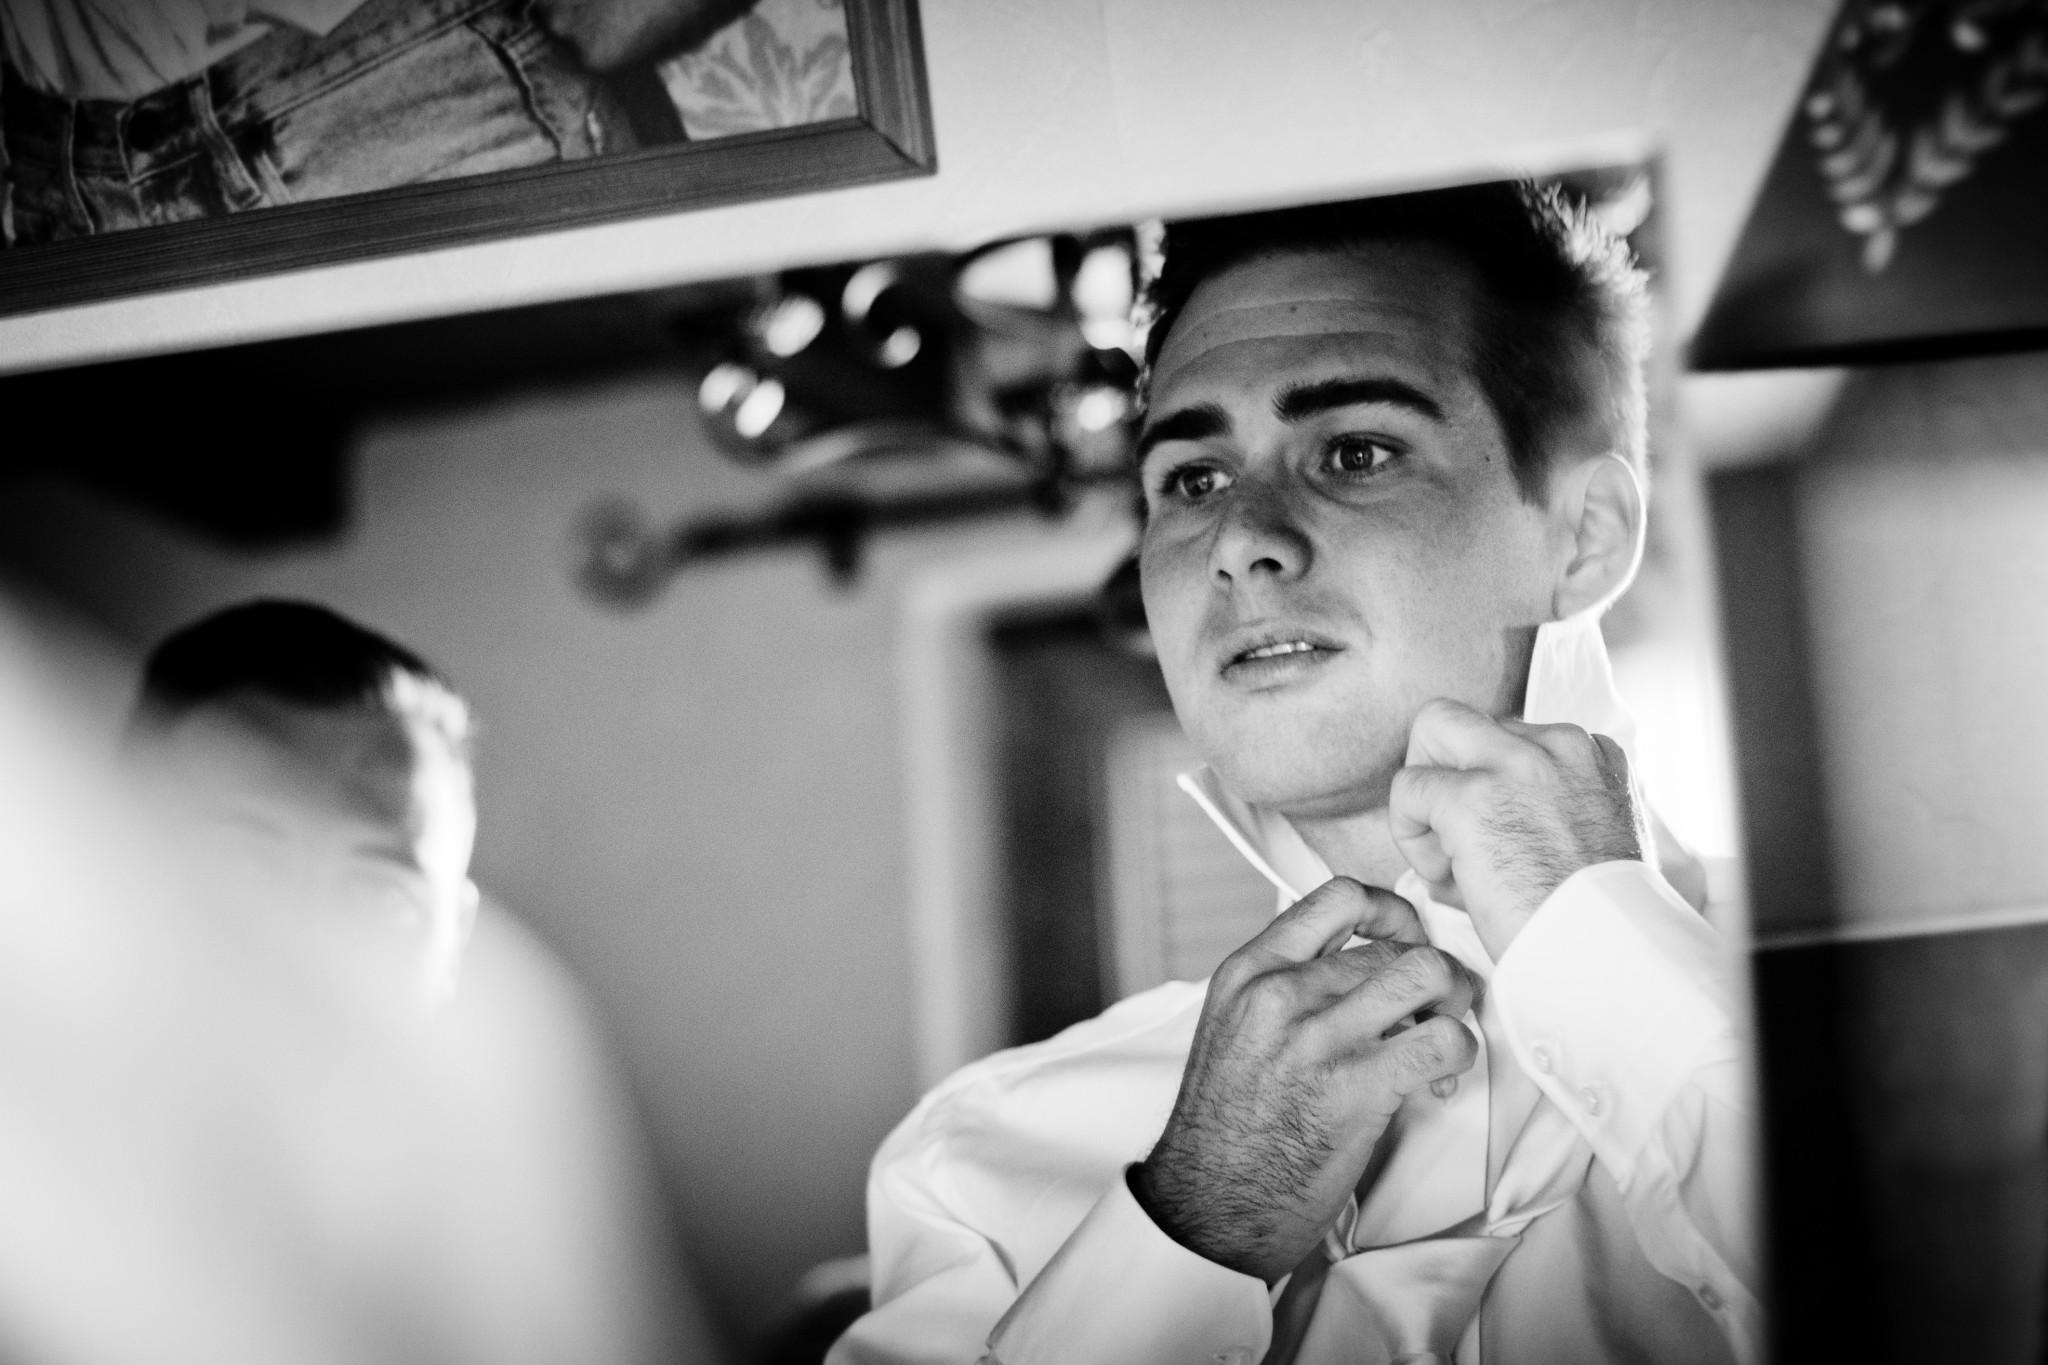 photographe mariage besancon preparatifs reportage sonia oysel - Photographe Mariage Besancon